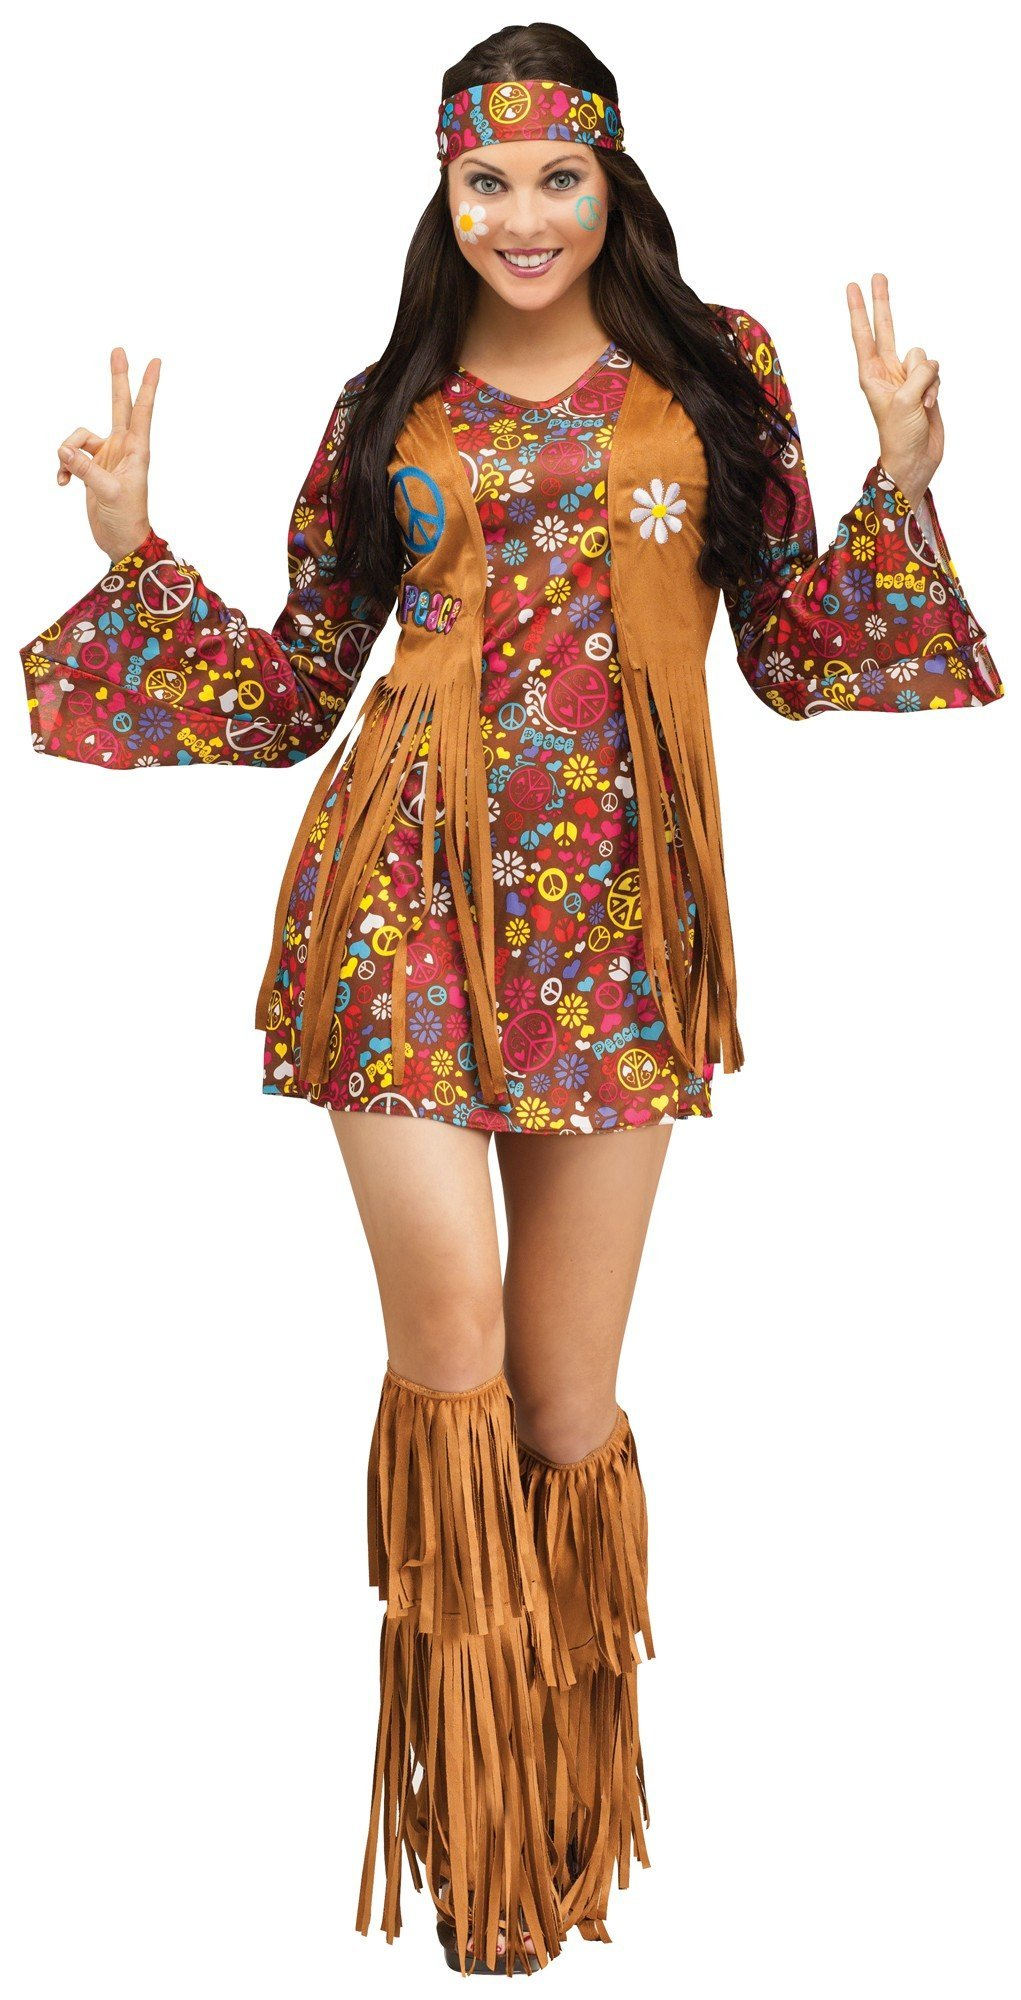 Fun World Costumes Women's Peace Love Hippie Adult Costume, Brown, Small/Medium